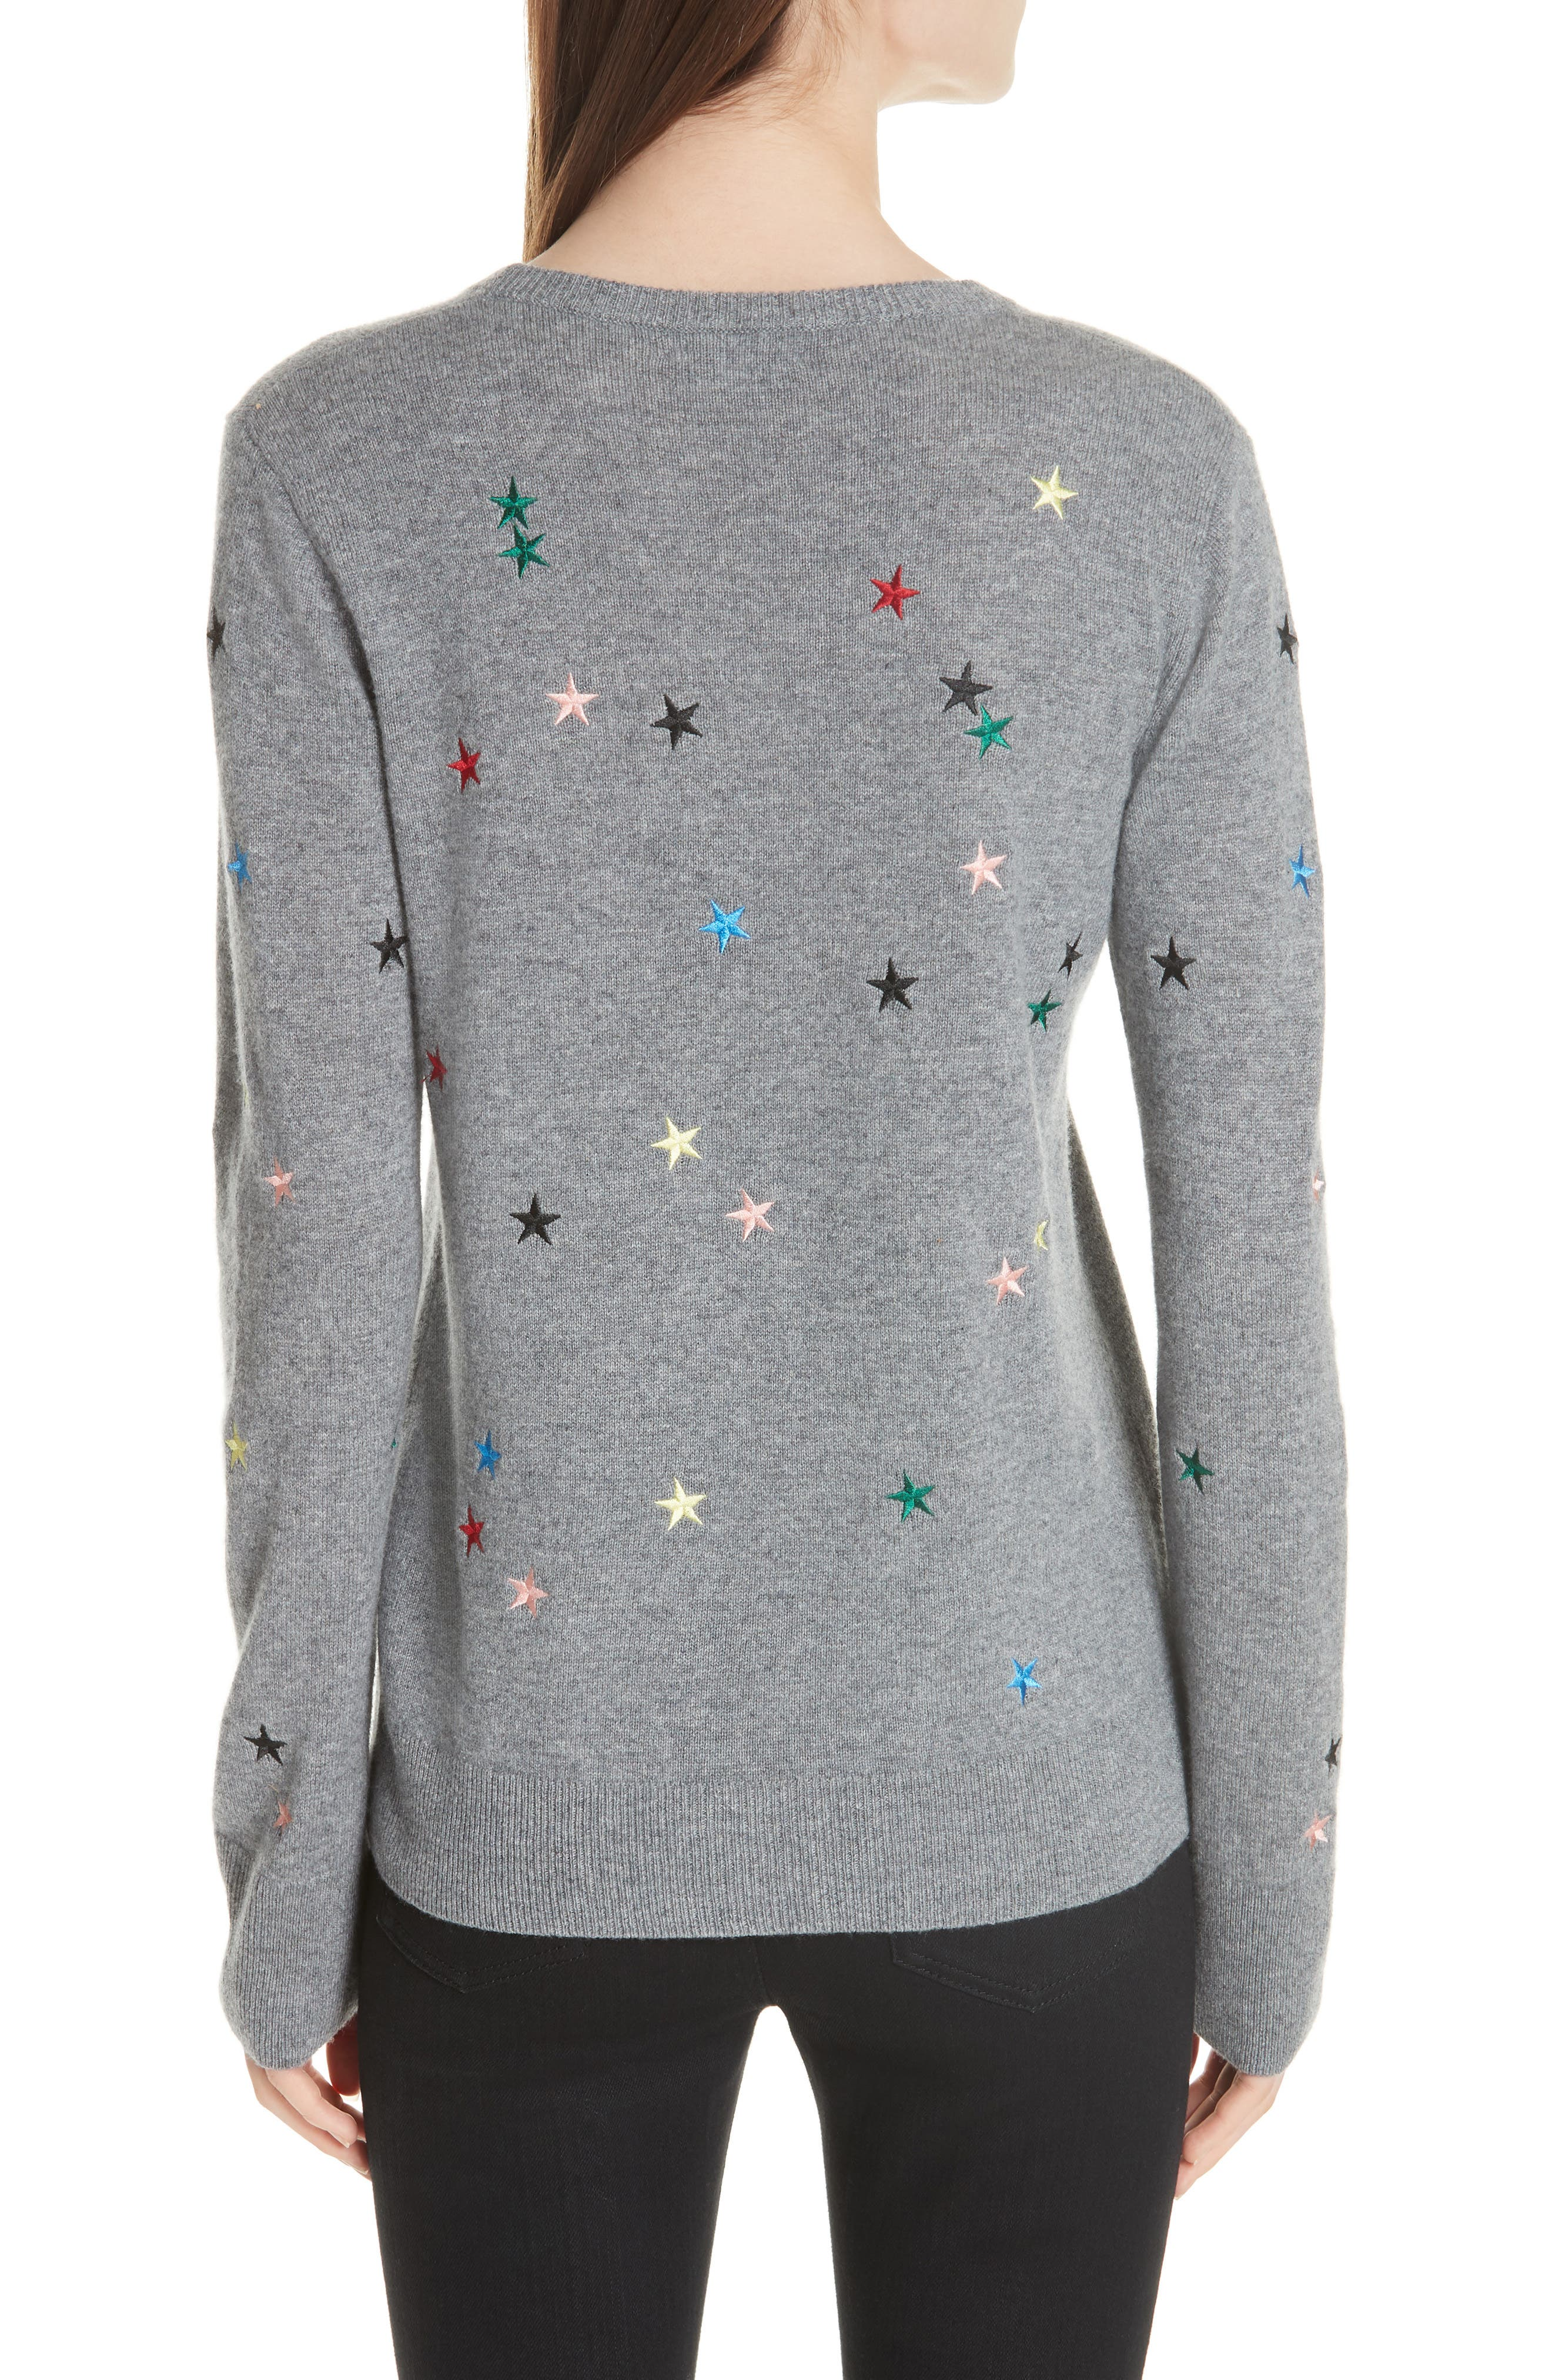 Shane Star Cashmere Sweater,                             Alternate thumbnail 2, color,                             030